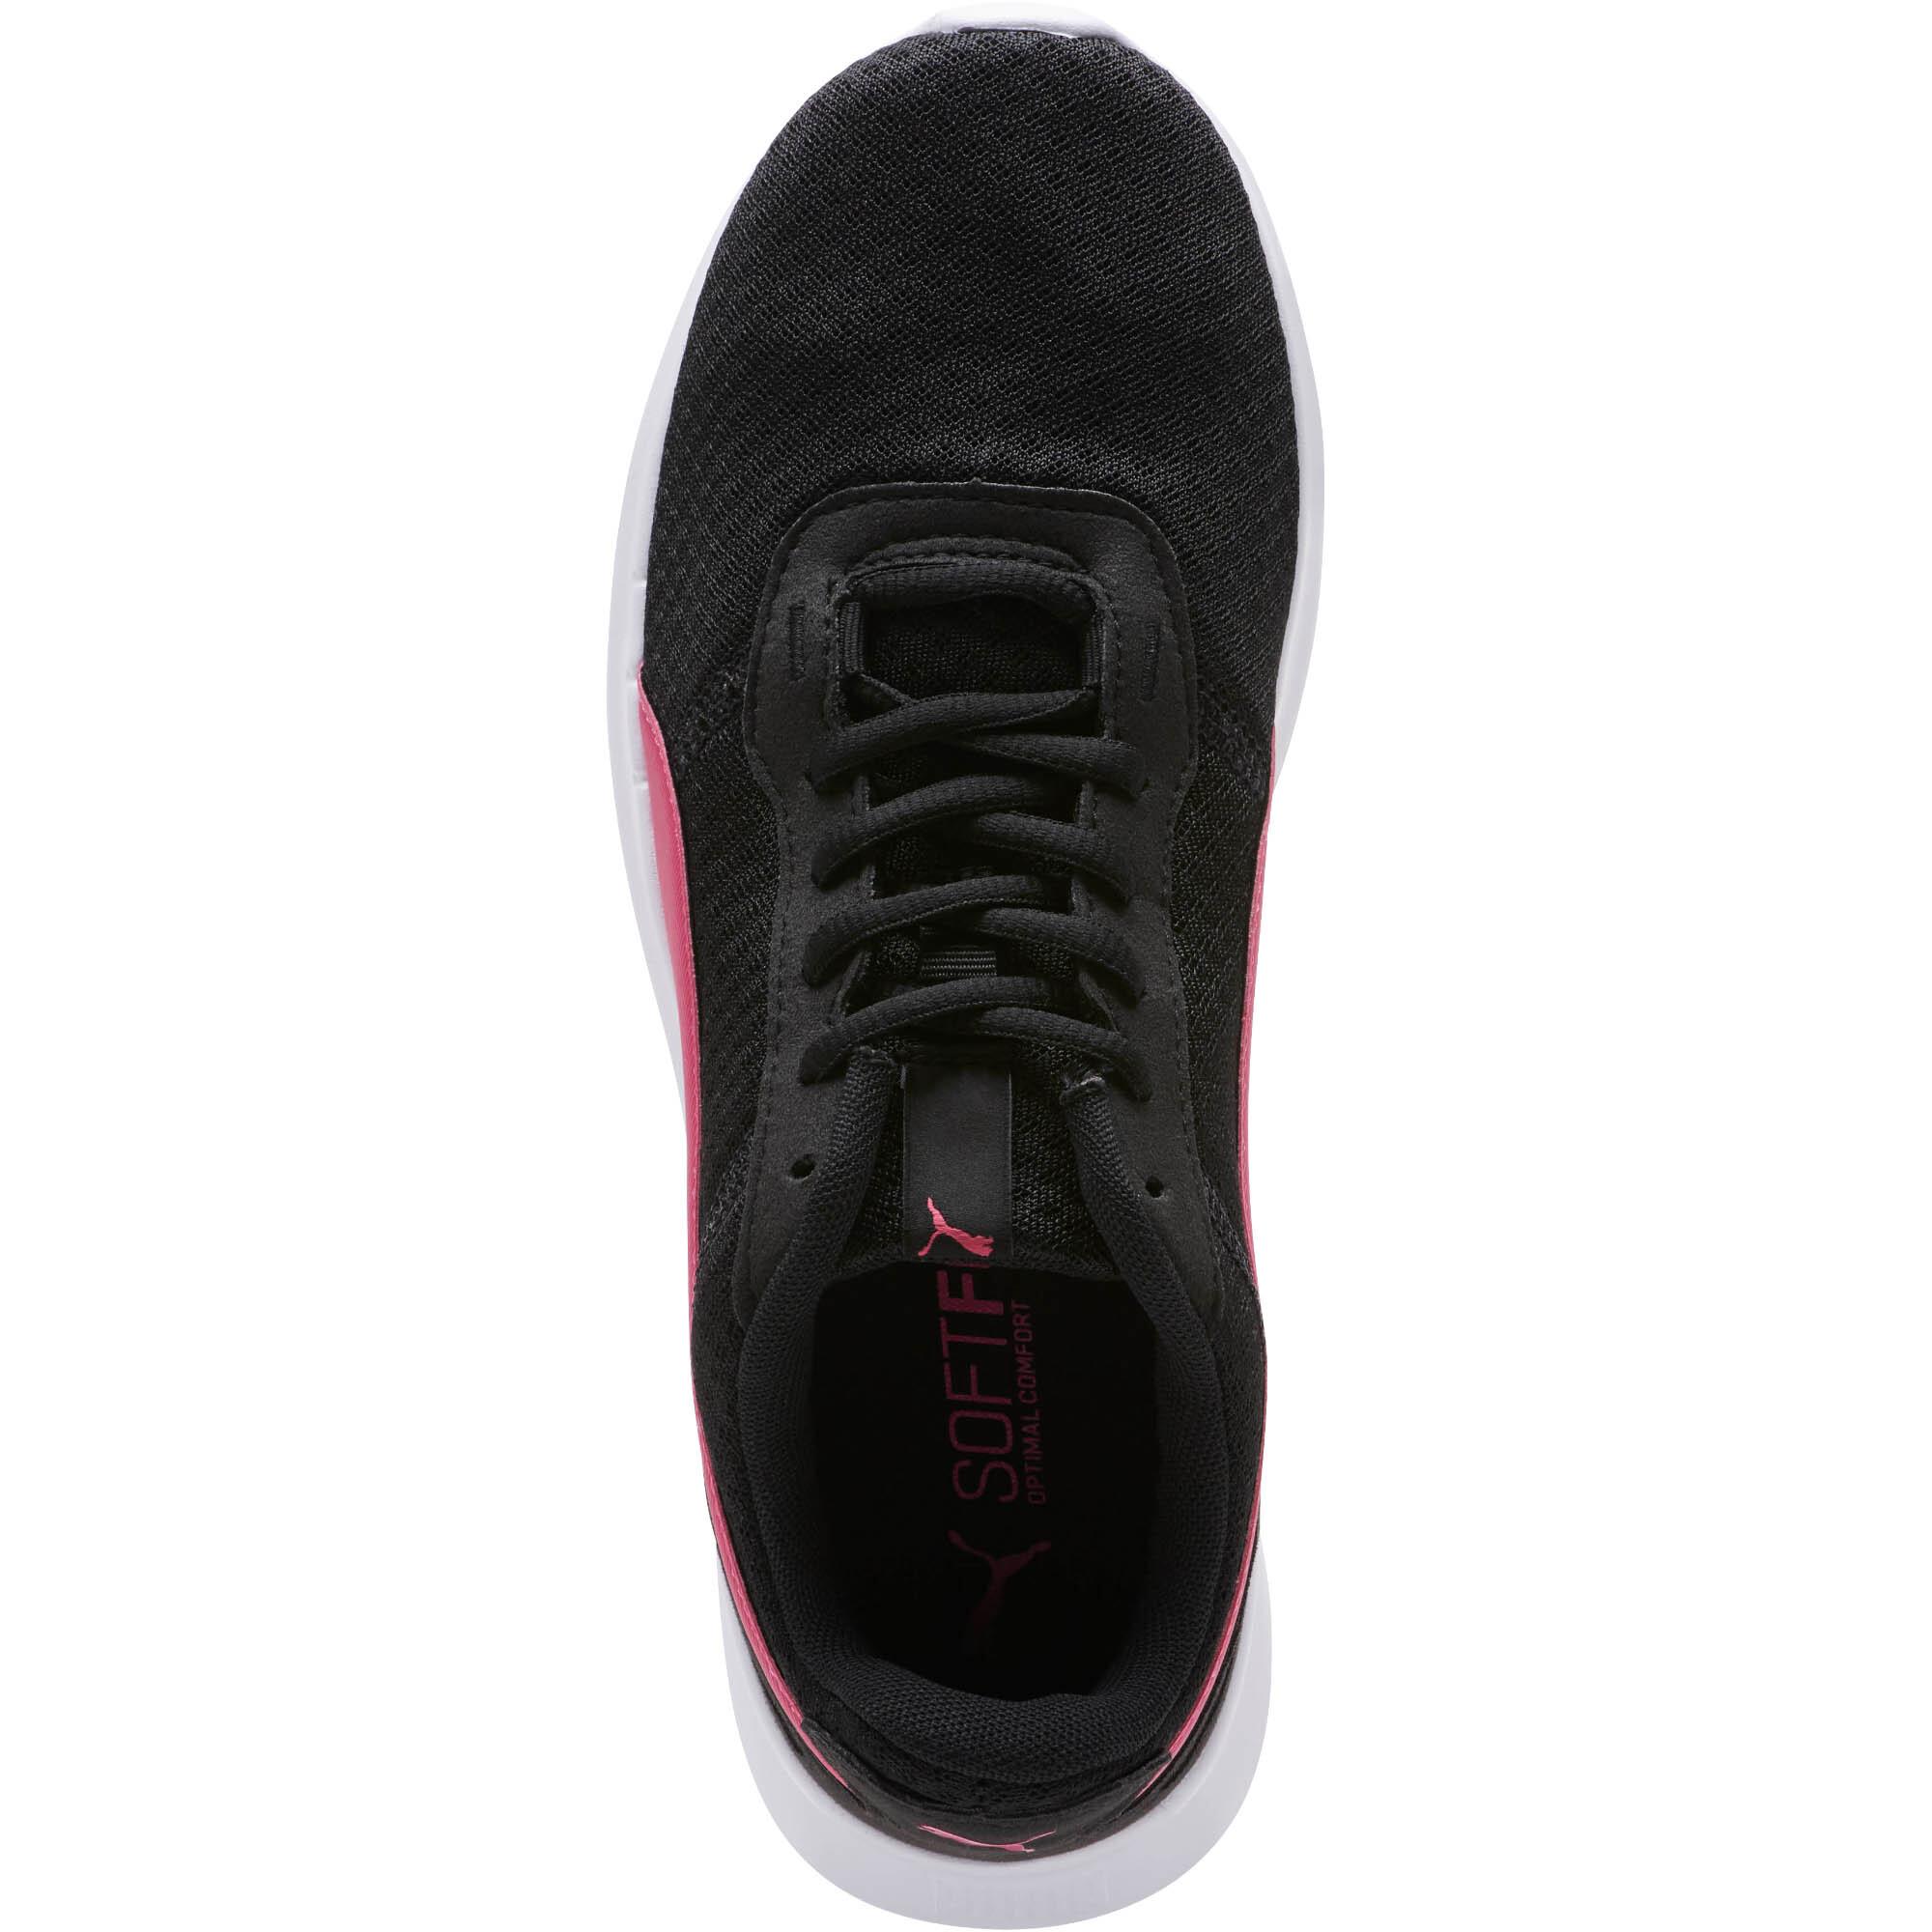 PUMA-ST-Activate-Women-s-Sneakers-Women-Shoe-Basics thumbnail 11